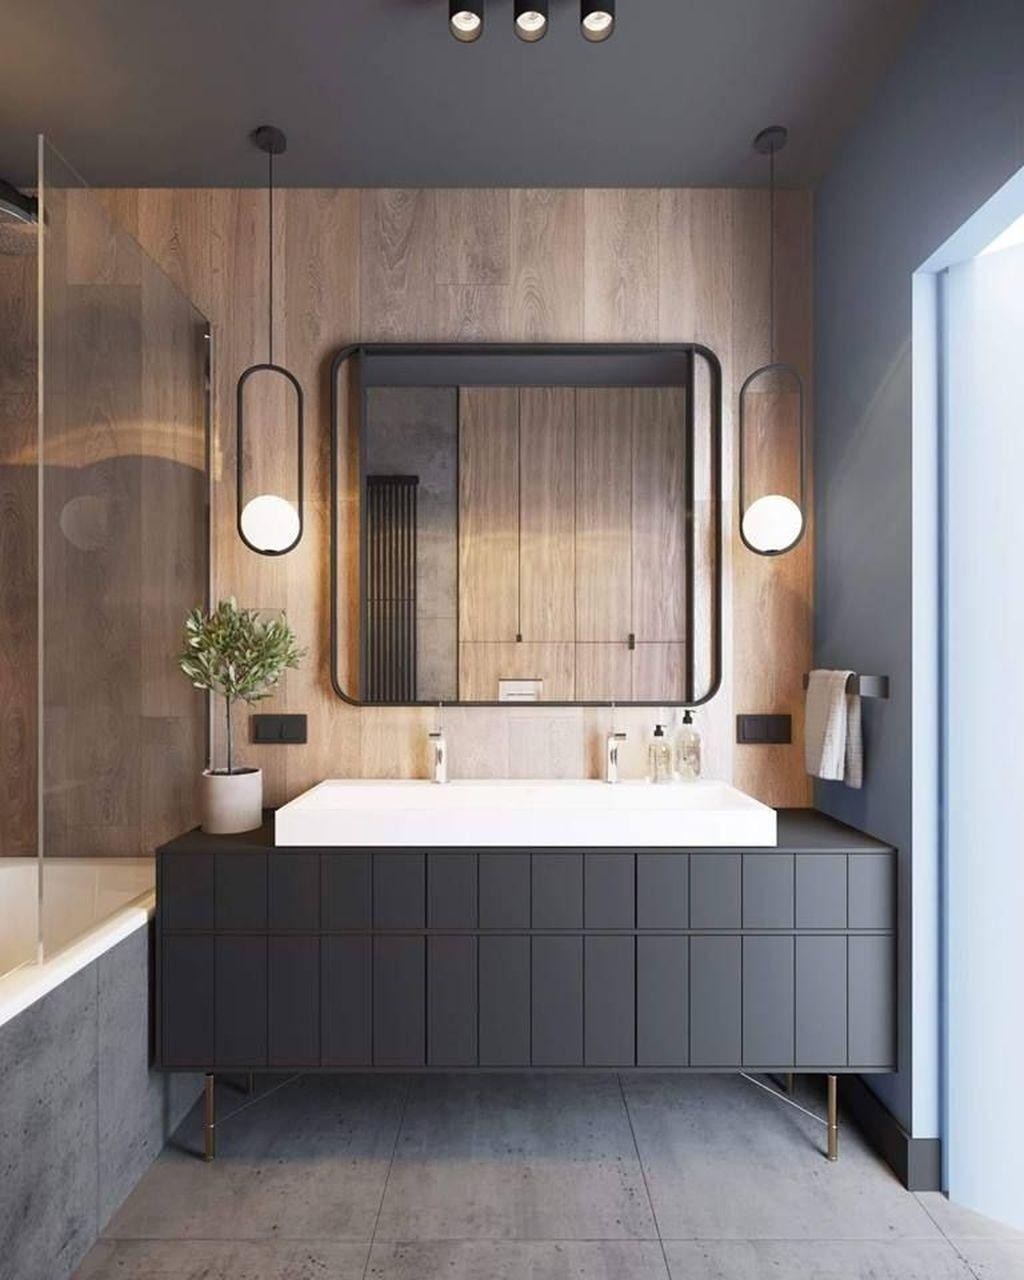 Pin On Bathroom Bathroom mirrors ideas for home